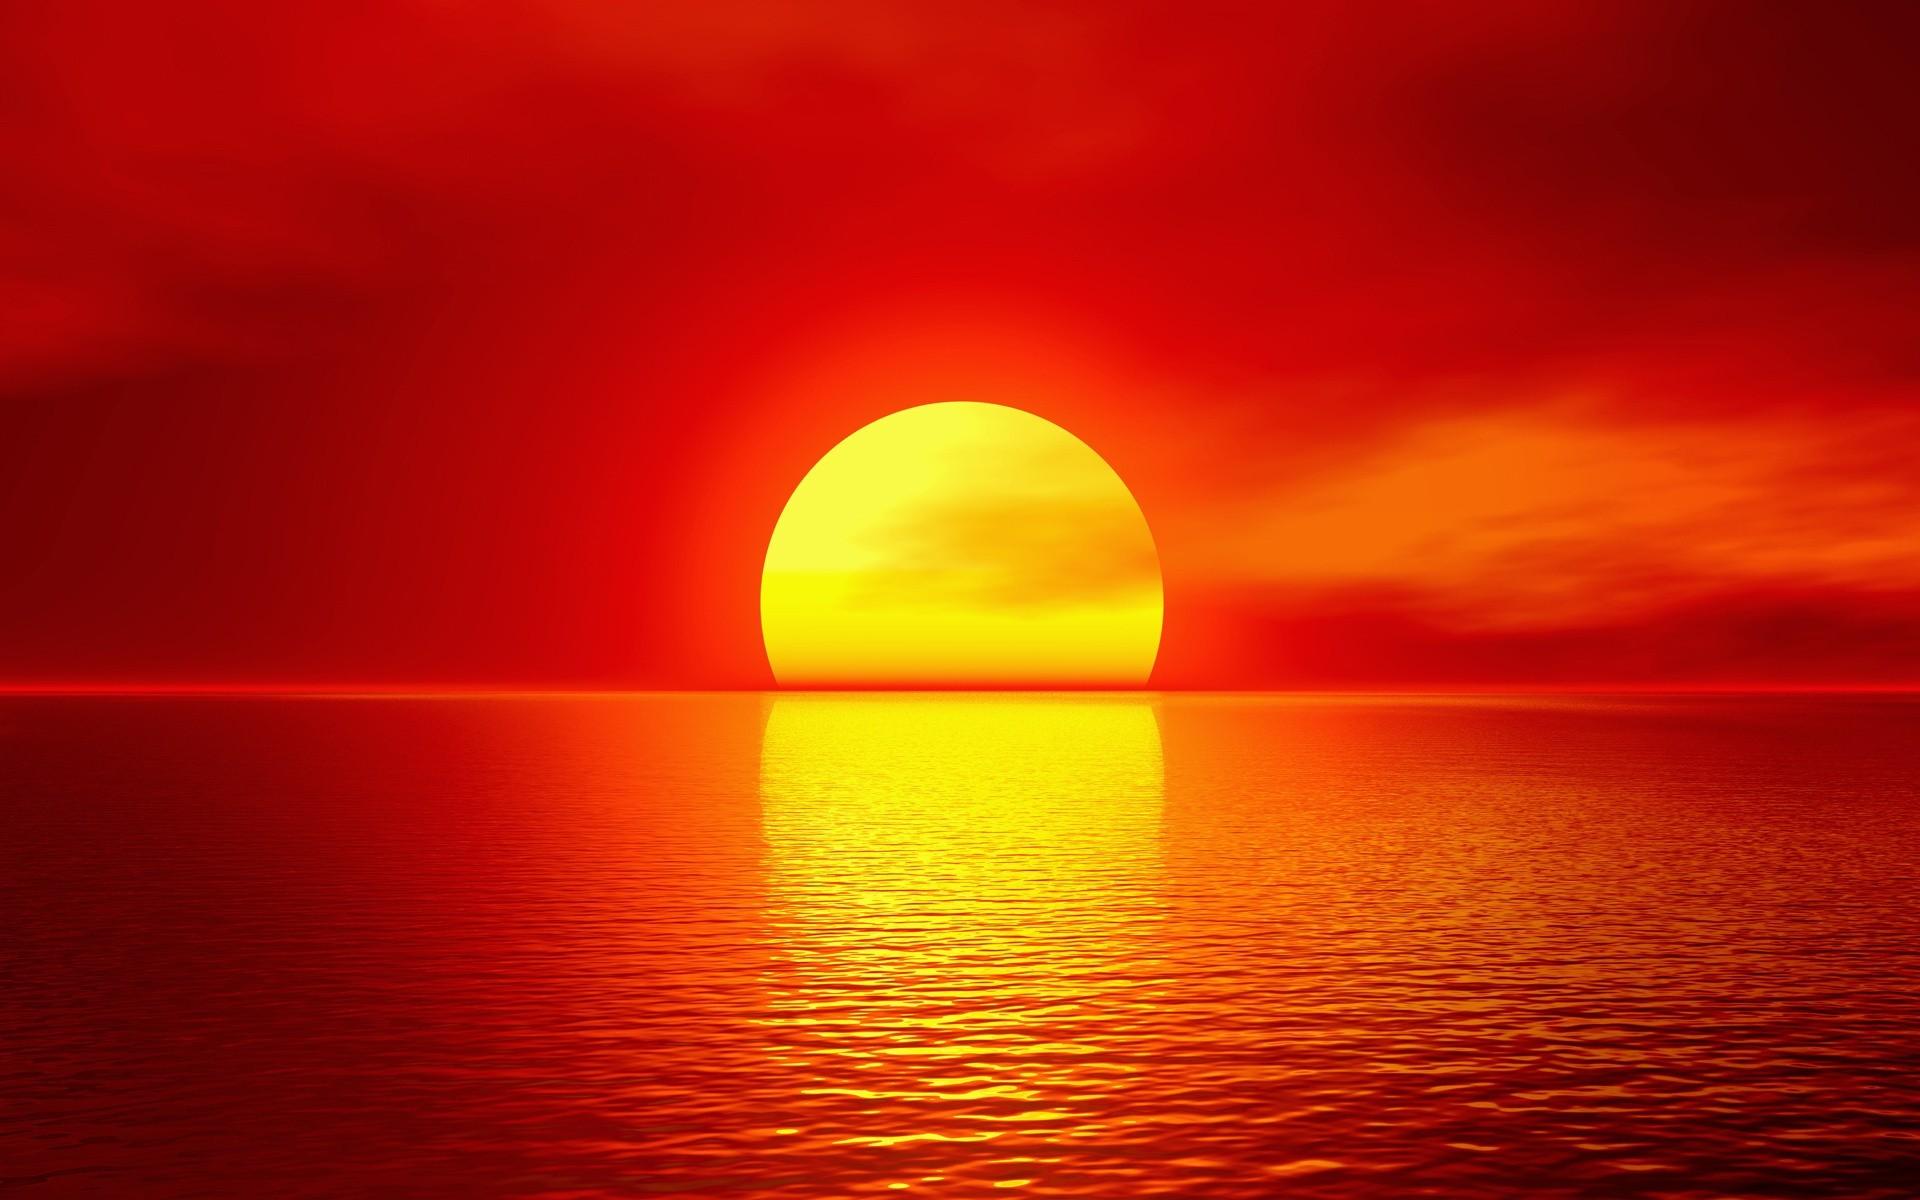 Golden Sunset HD Desktop Background wallpaper free   Luna Sol Mar    Pinterest   Hd desktop and Desktop backgrounds